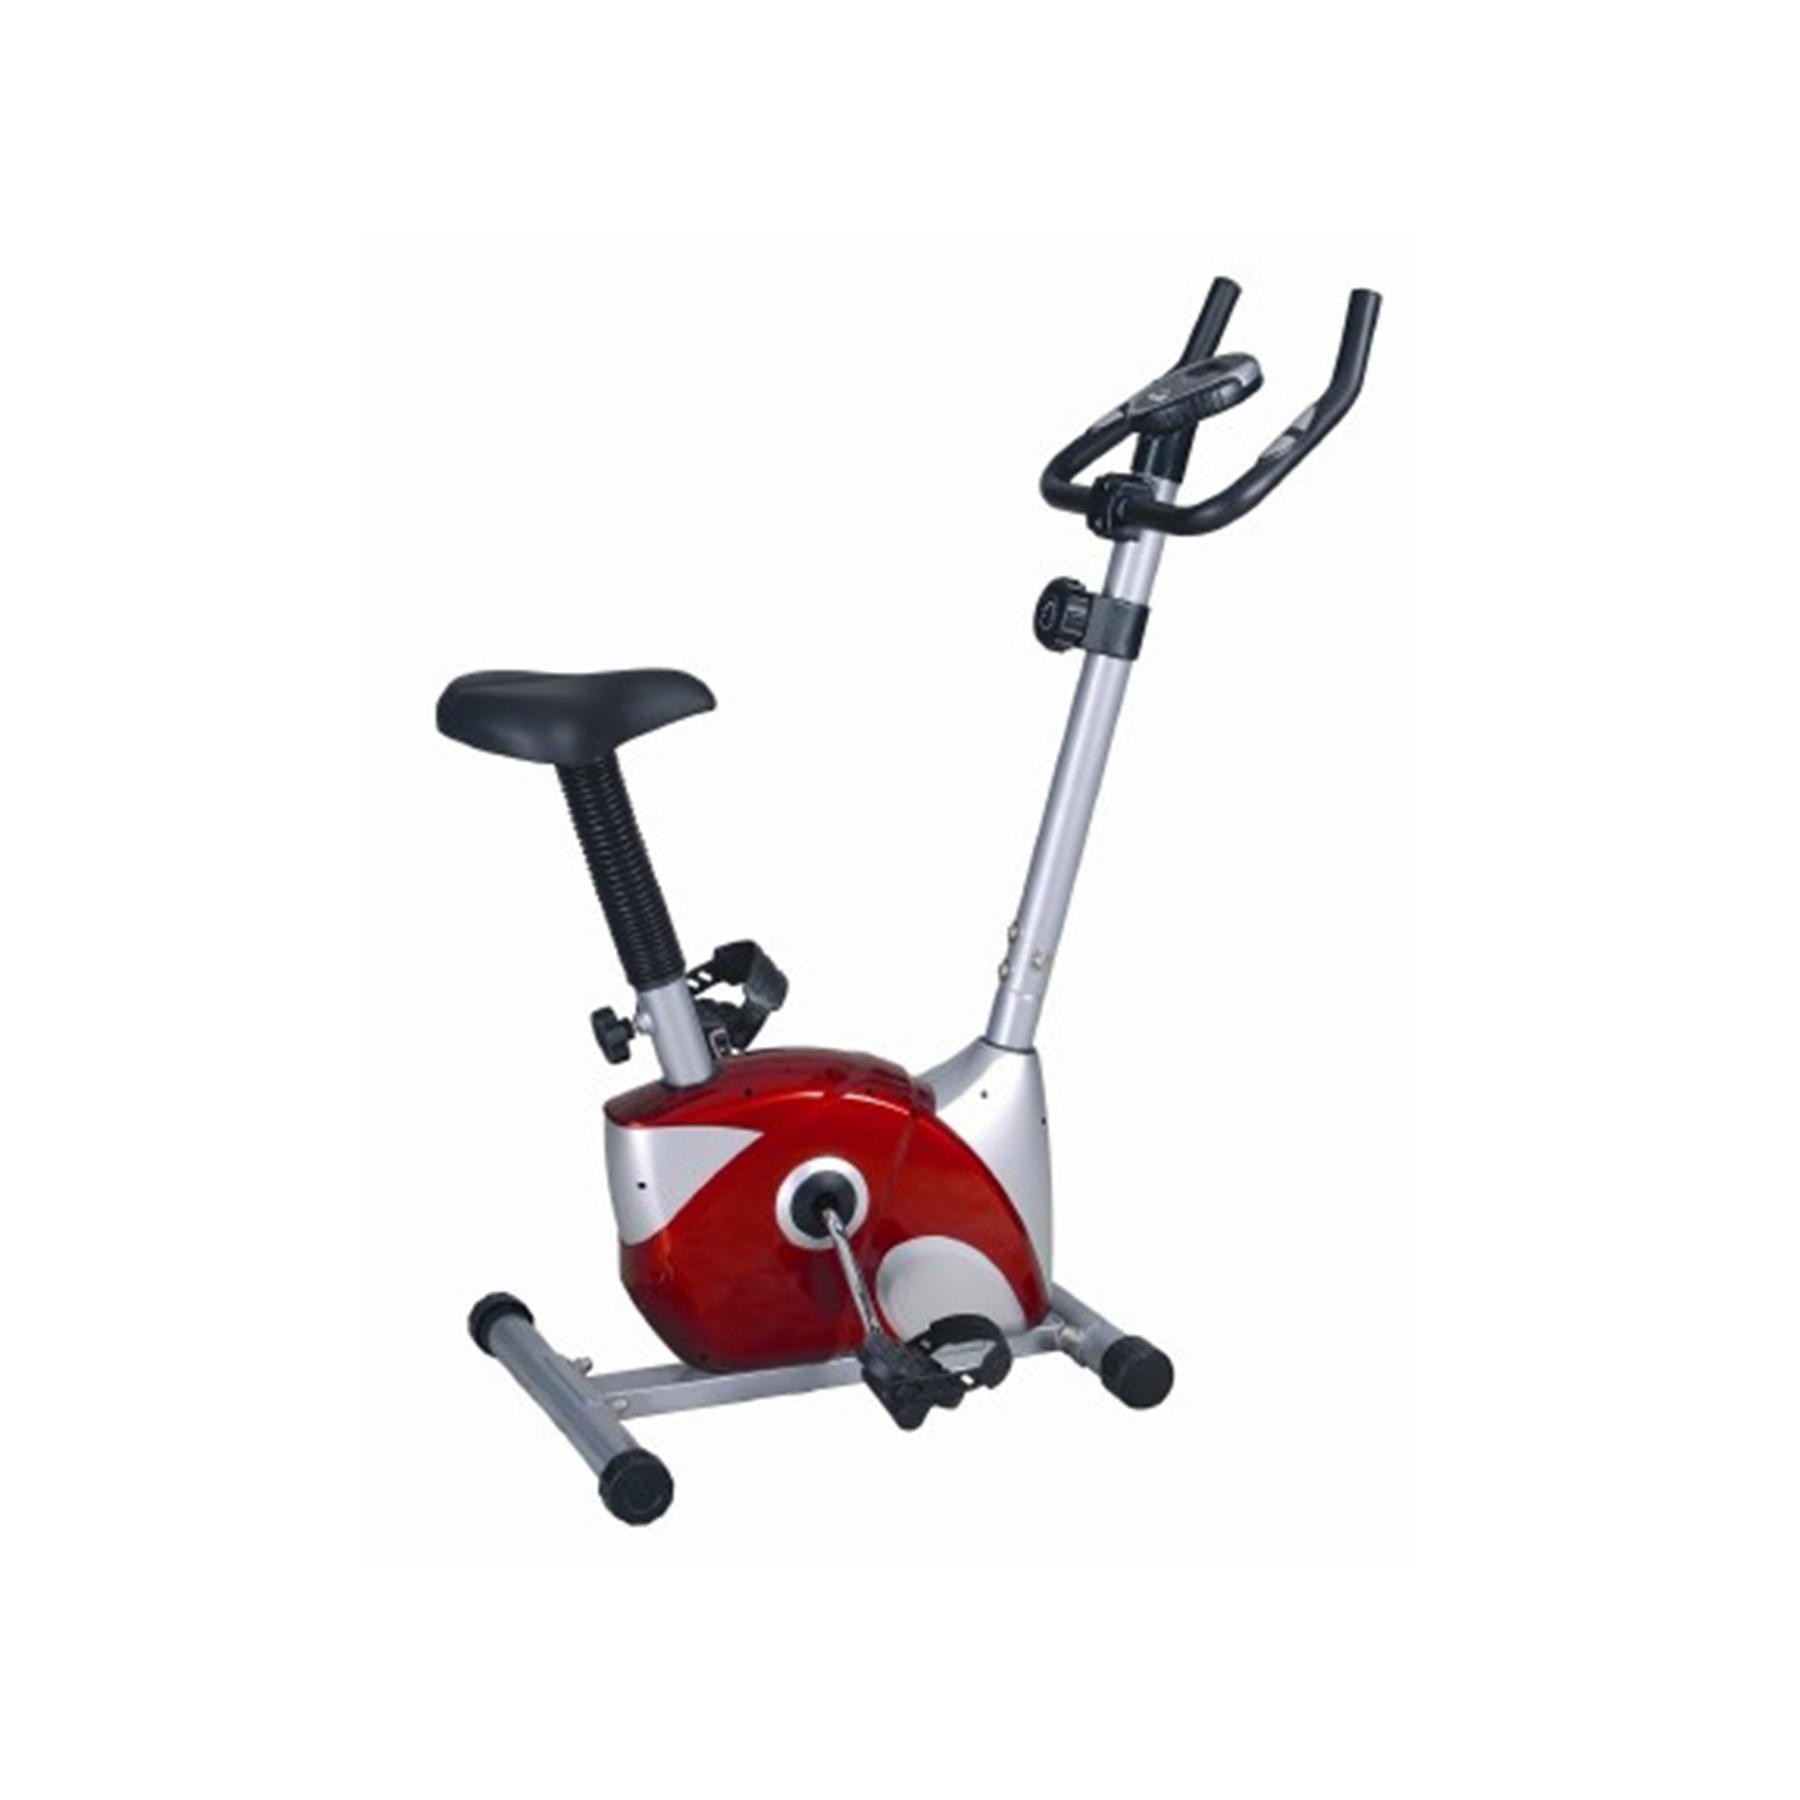 Велотренажер магнитный BC SE-300  маховик 4кг, макс.нагр. 100кг*